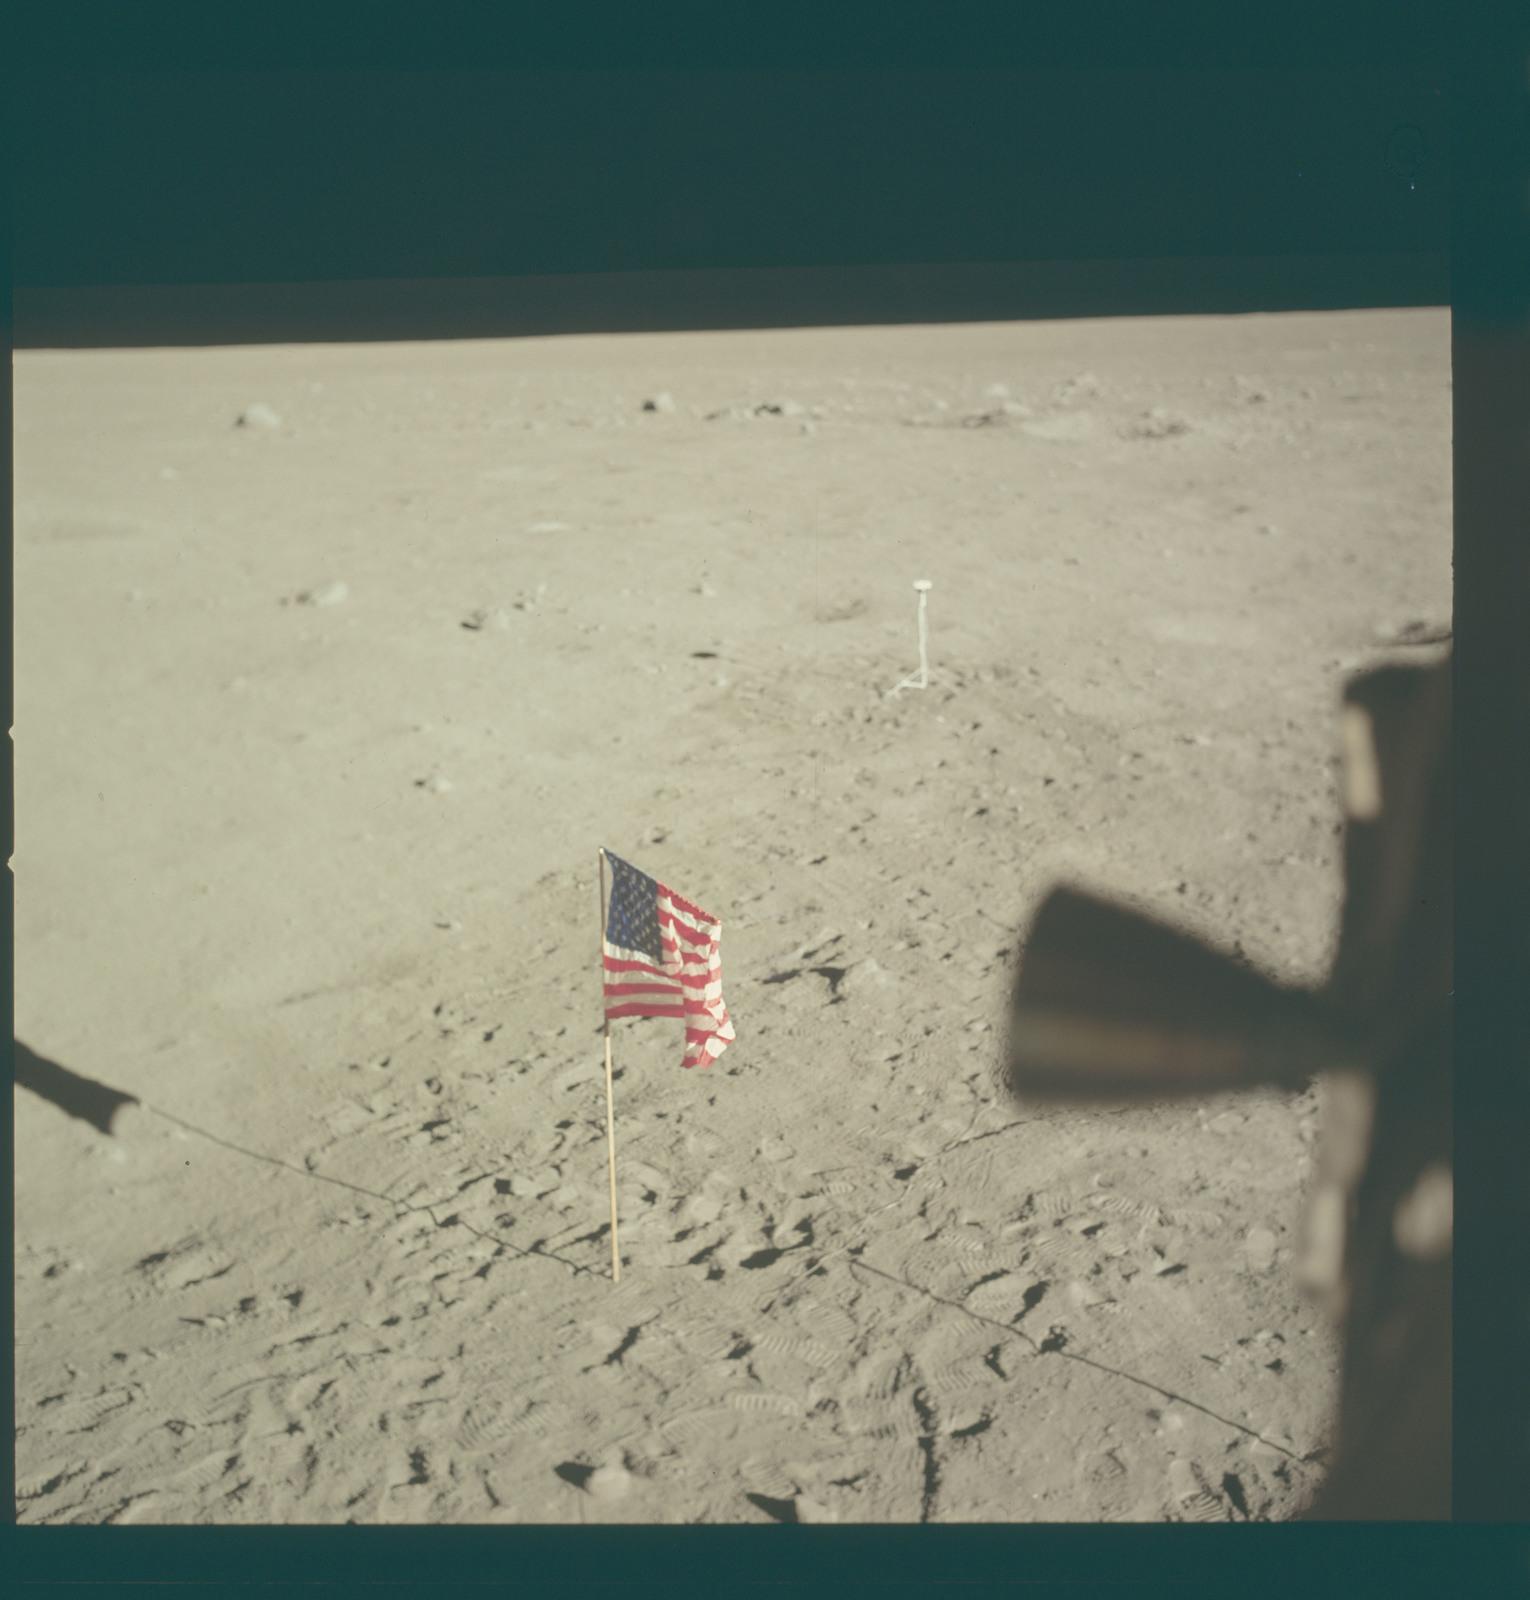 AS11-37-5546 - Apollo 11 - Apollo 11 Mission image - Lunar horizon from Tranquility Base